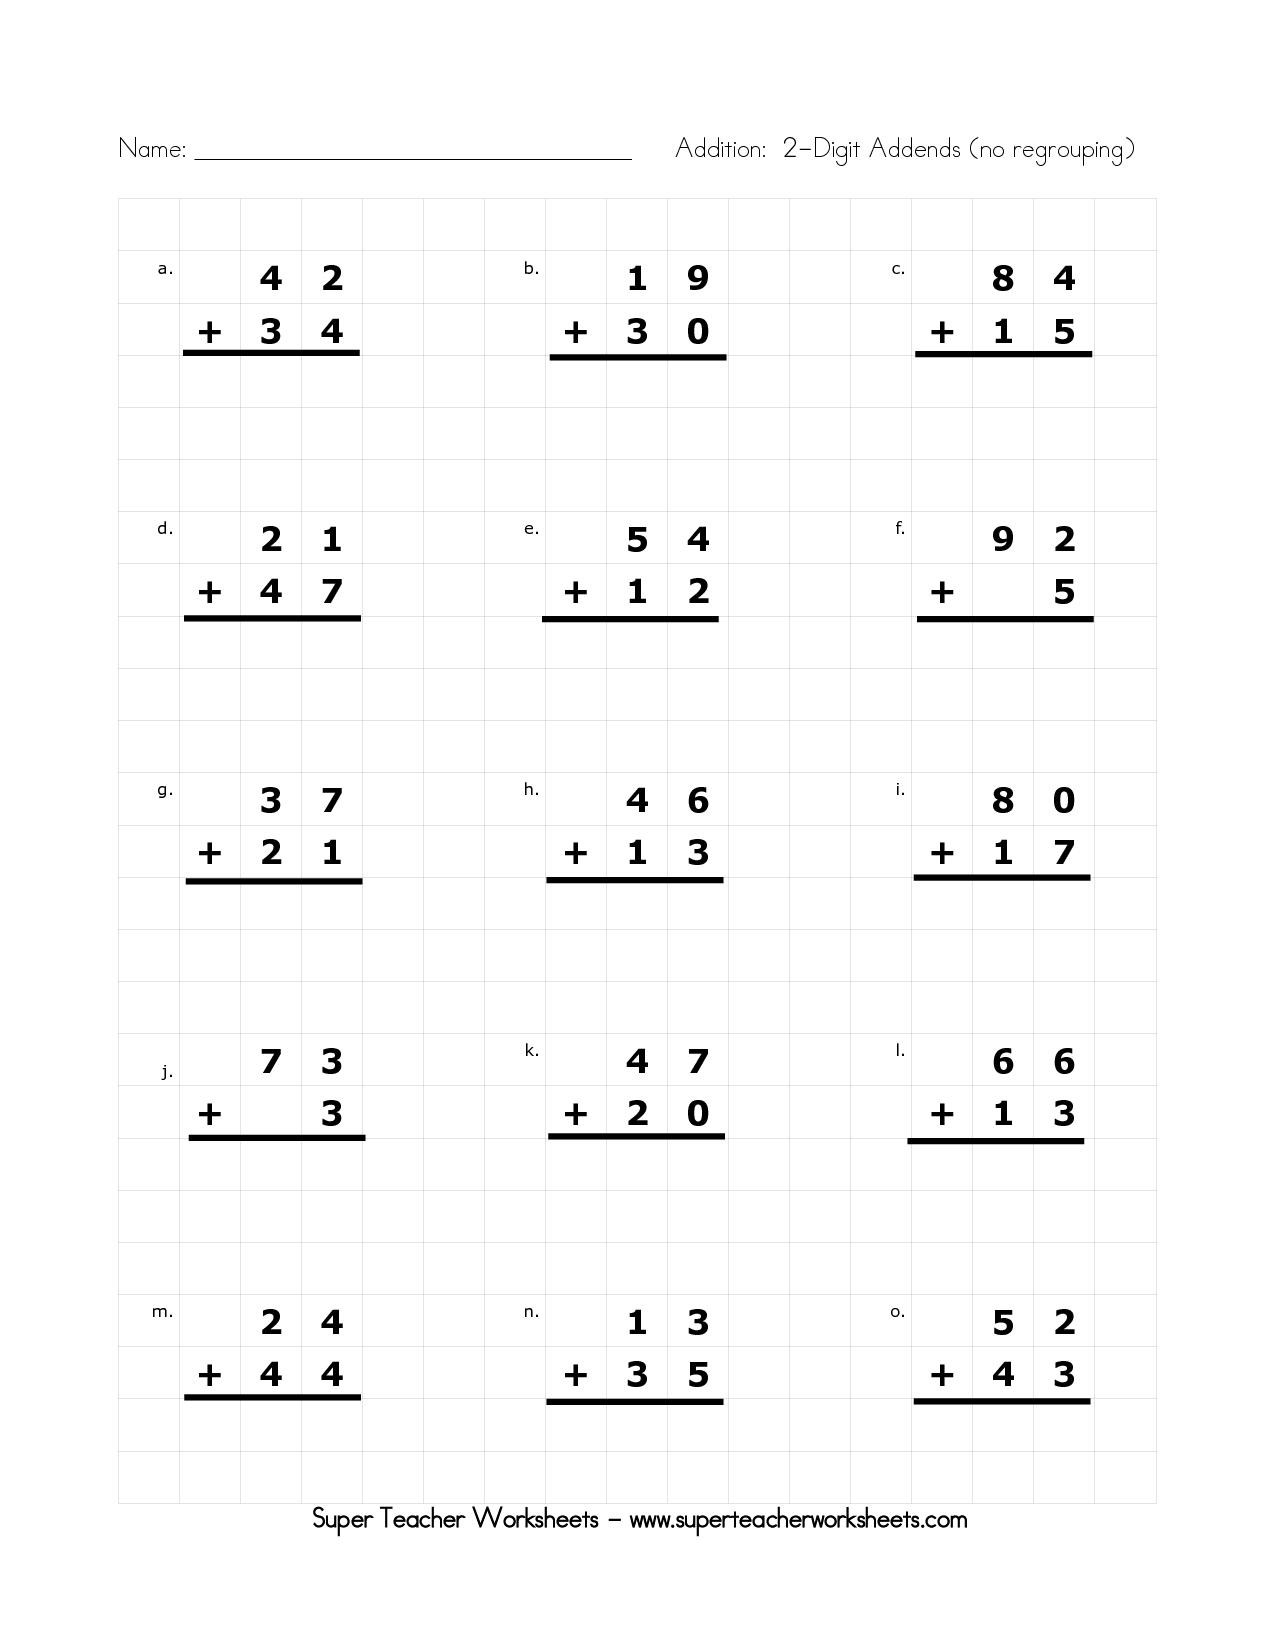 medium resolution of https://dubaikhalifas.com/2-digit-addition-without-regrouping-worksheets-mykinglist-2nd-grade-math-worksheets/